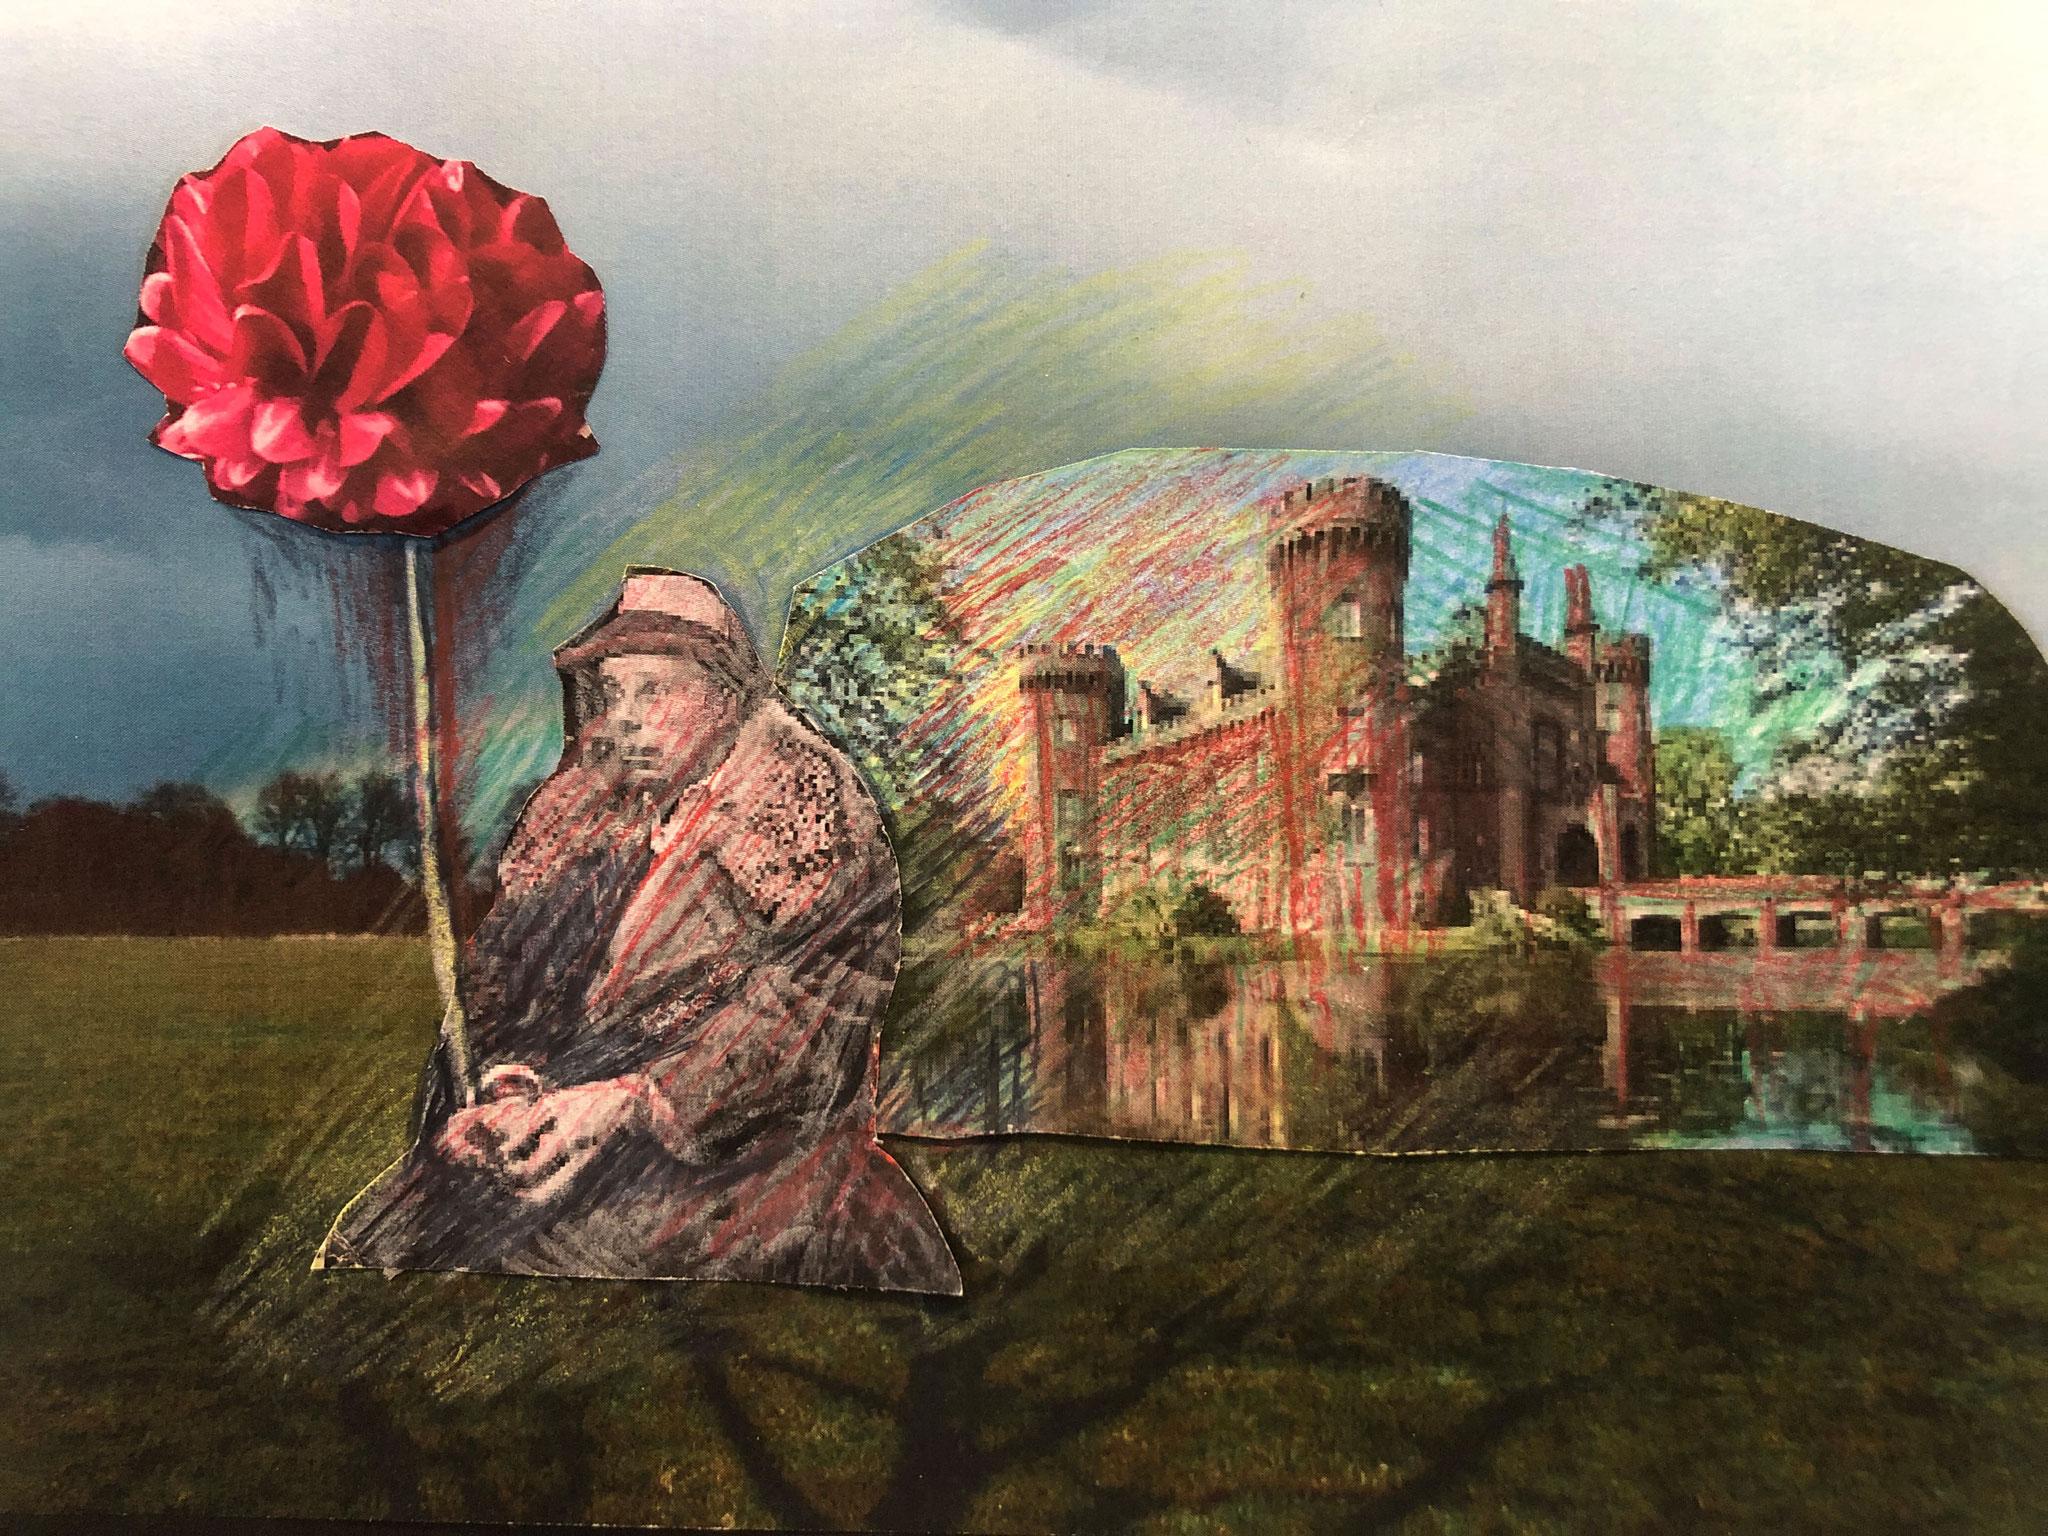 """The spirit of Beuys cares of the dahlia breeding for Lintvelde"", 14,85 cm x 10,5 cm, 2021"